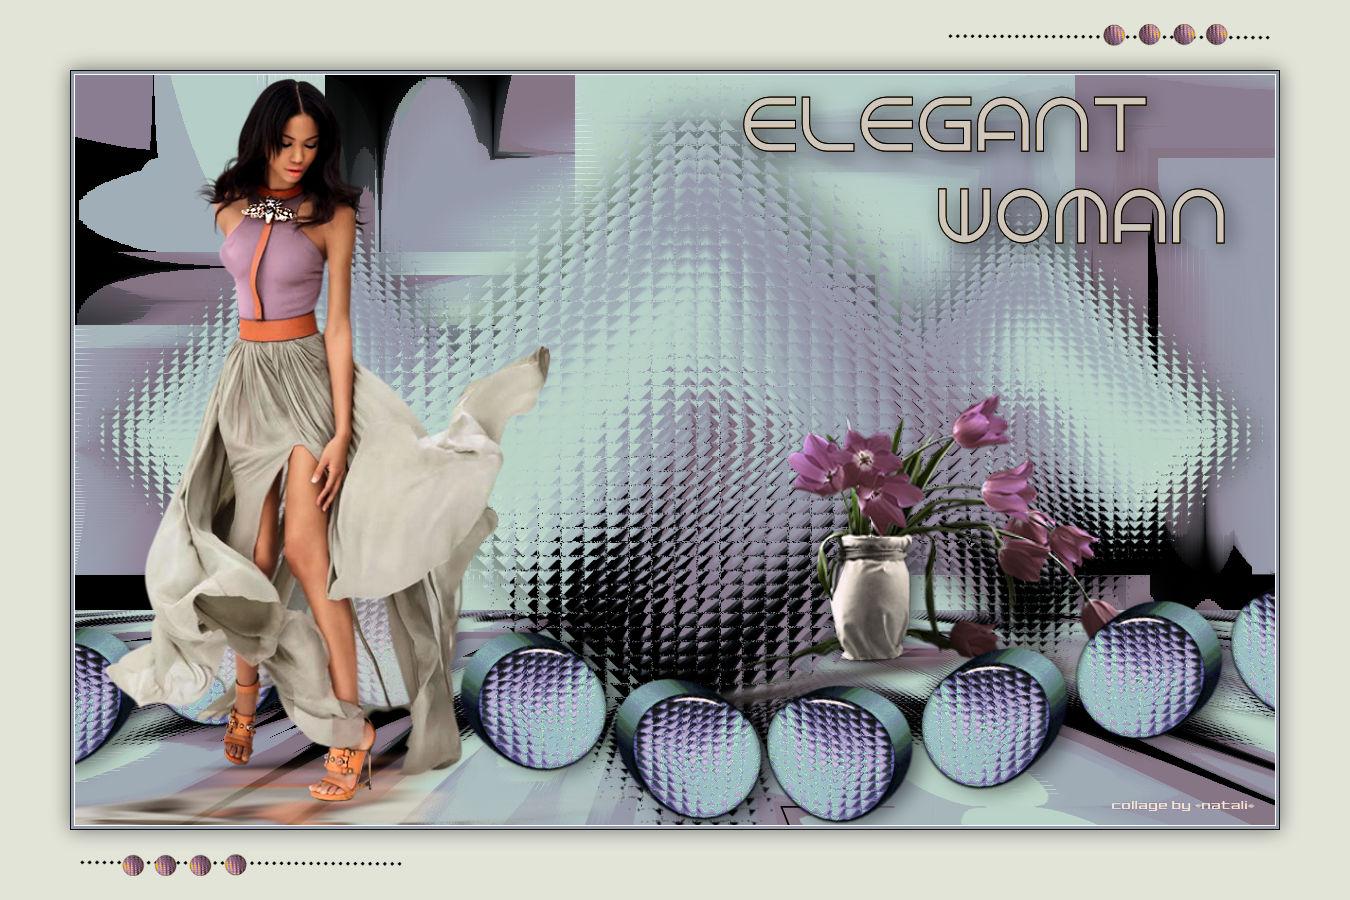 24.04.2018 Elegant woman